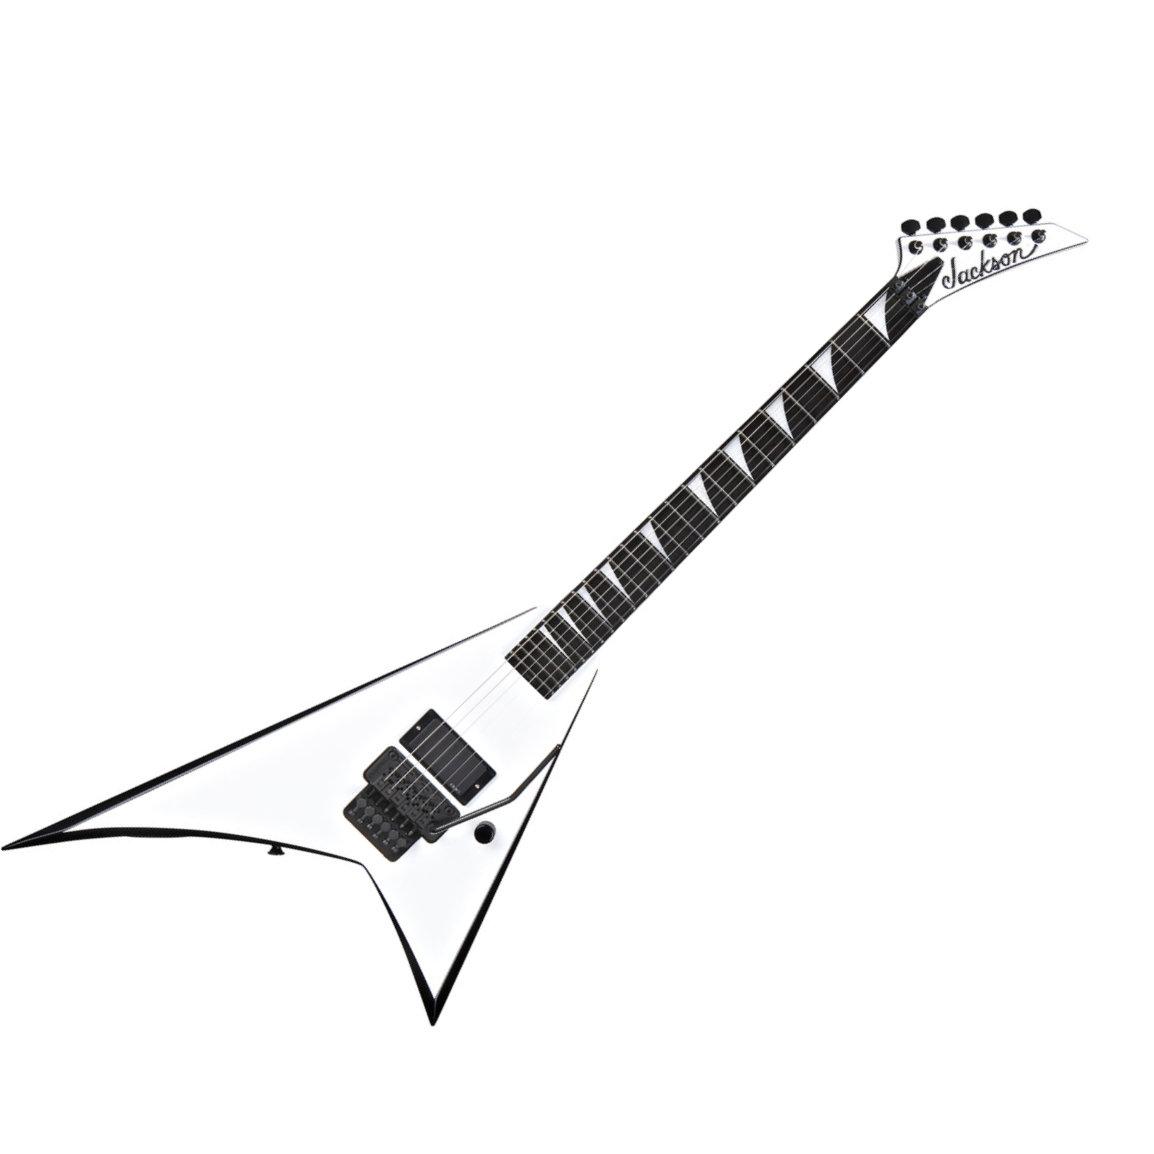 Shredpowerextreme Jackson Rr24 Randy Rhoads Pro Electric Guitar